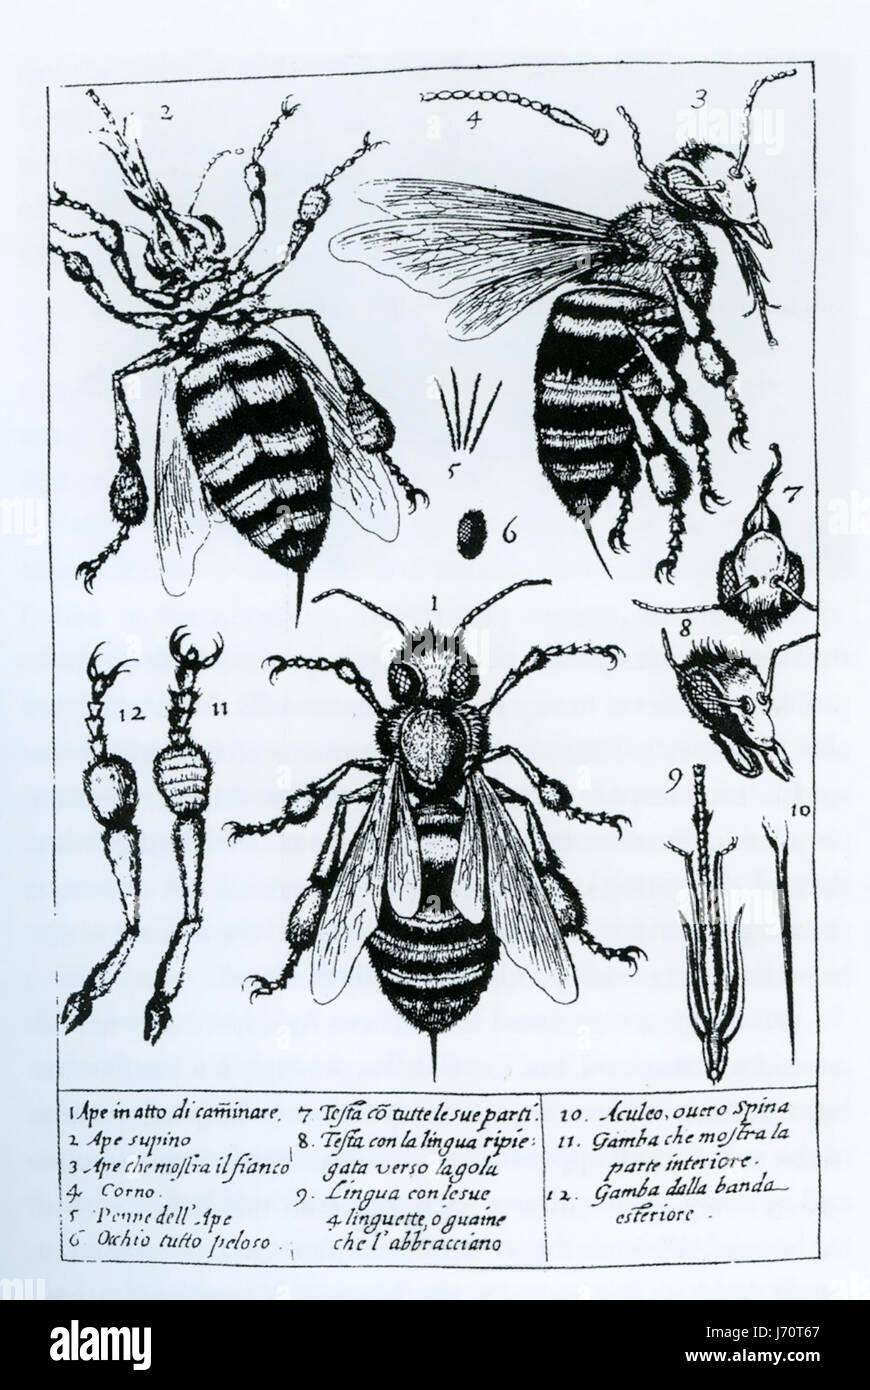 FRANCESCO STELLUTI (1577-1652) Italian polymath. Microscope drawings from his 1630 book 'Persio tradotto  in - Stock-Bilder